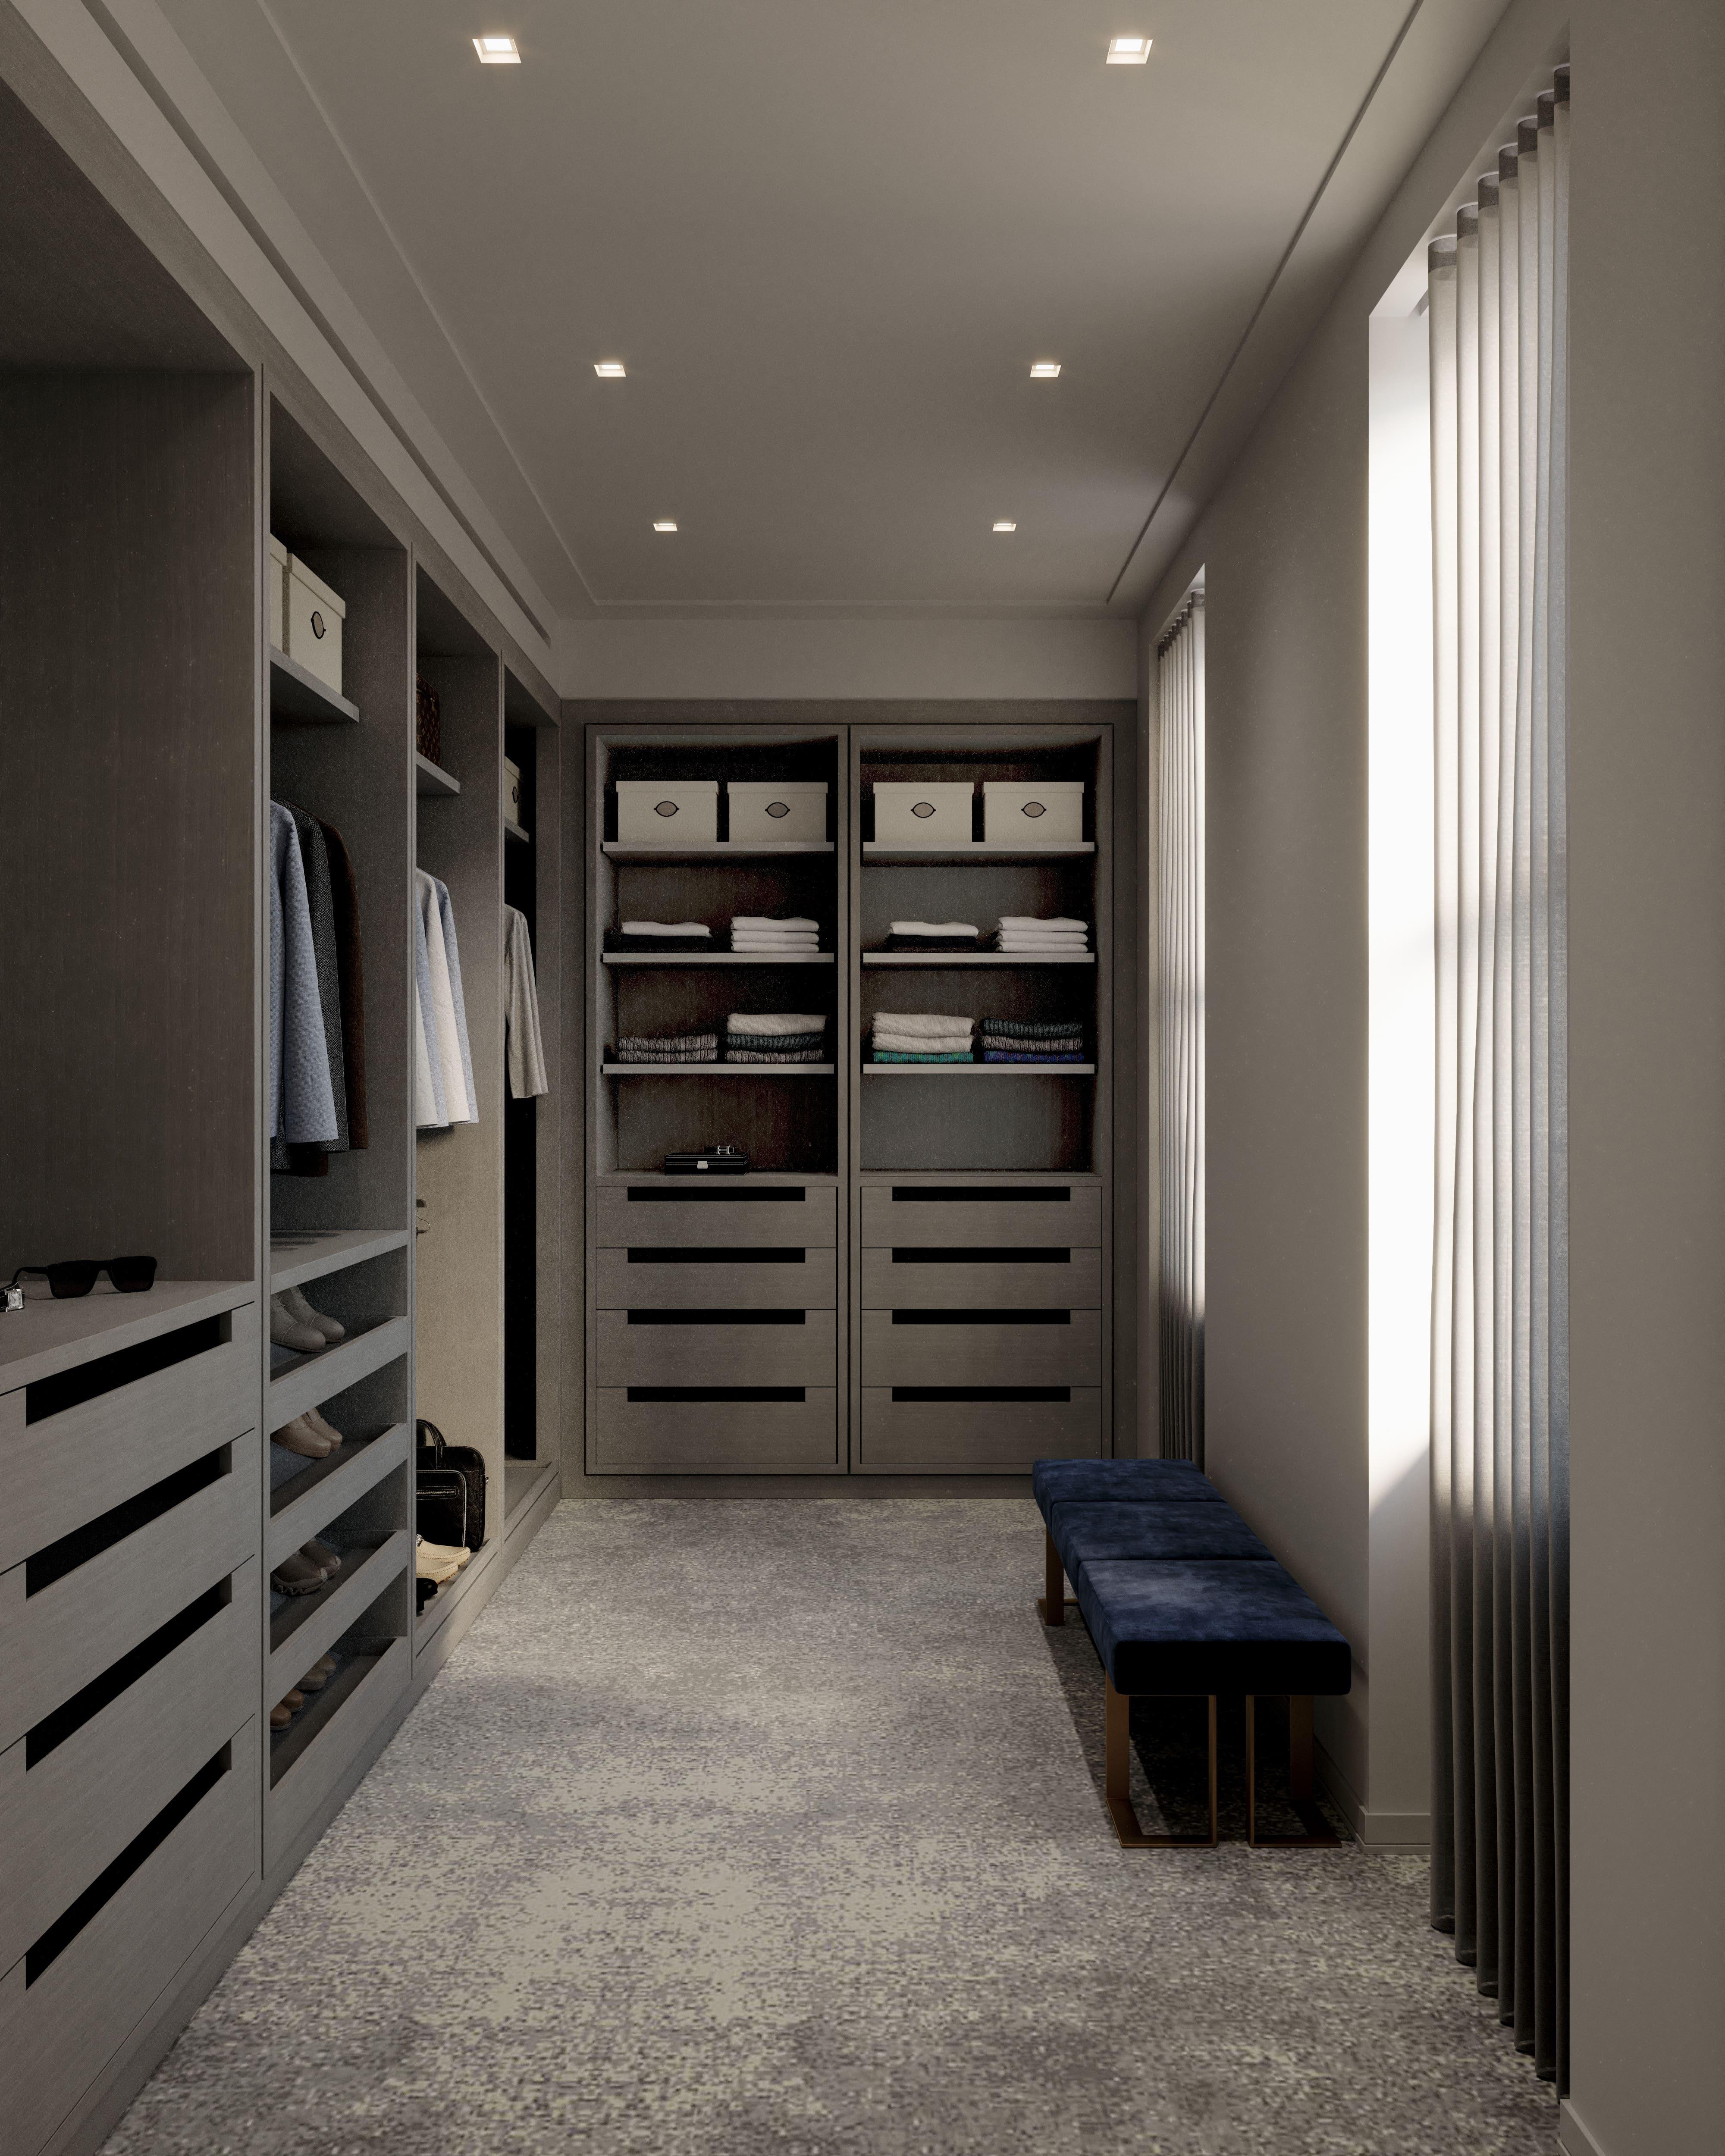 condo 3 - master closet 1 (view 2)